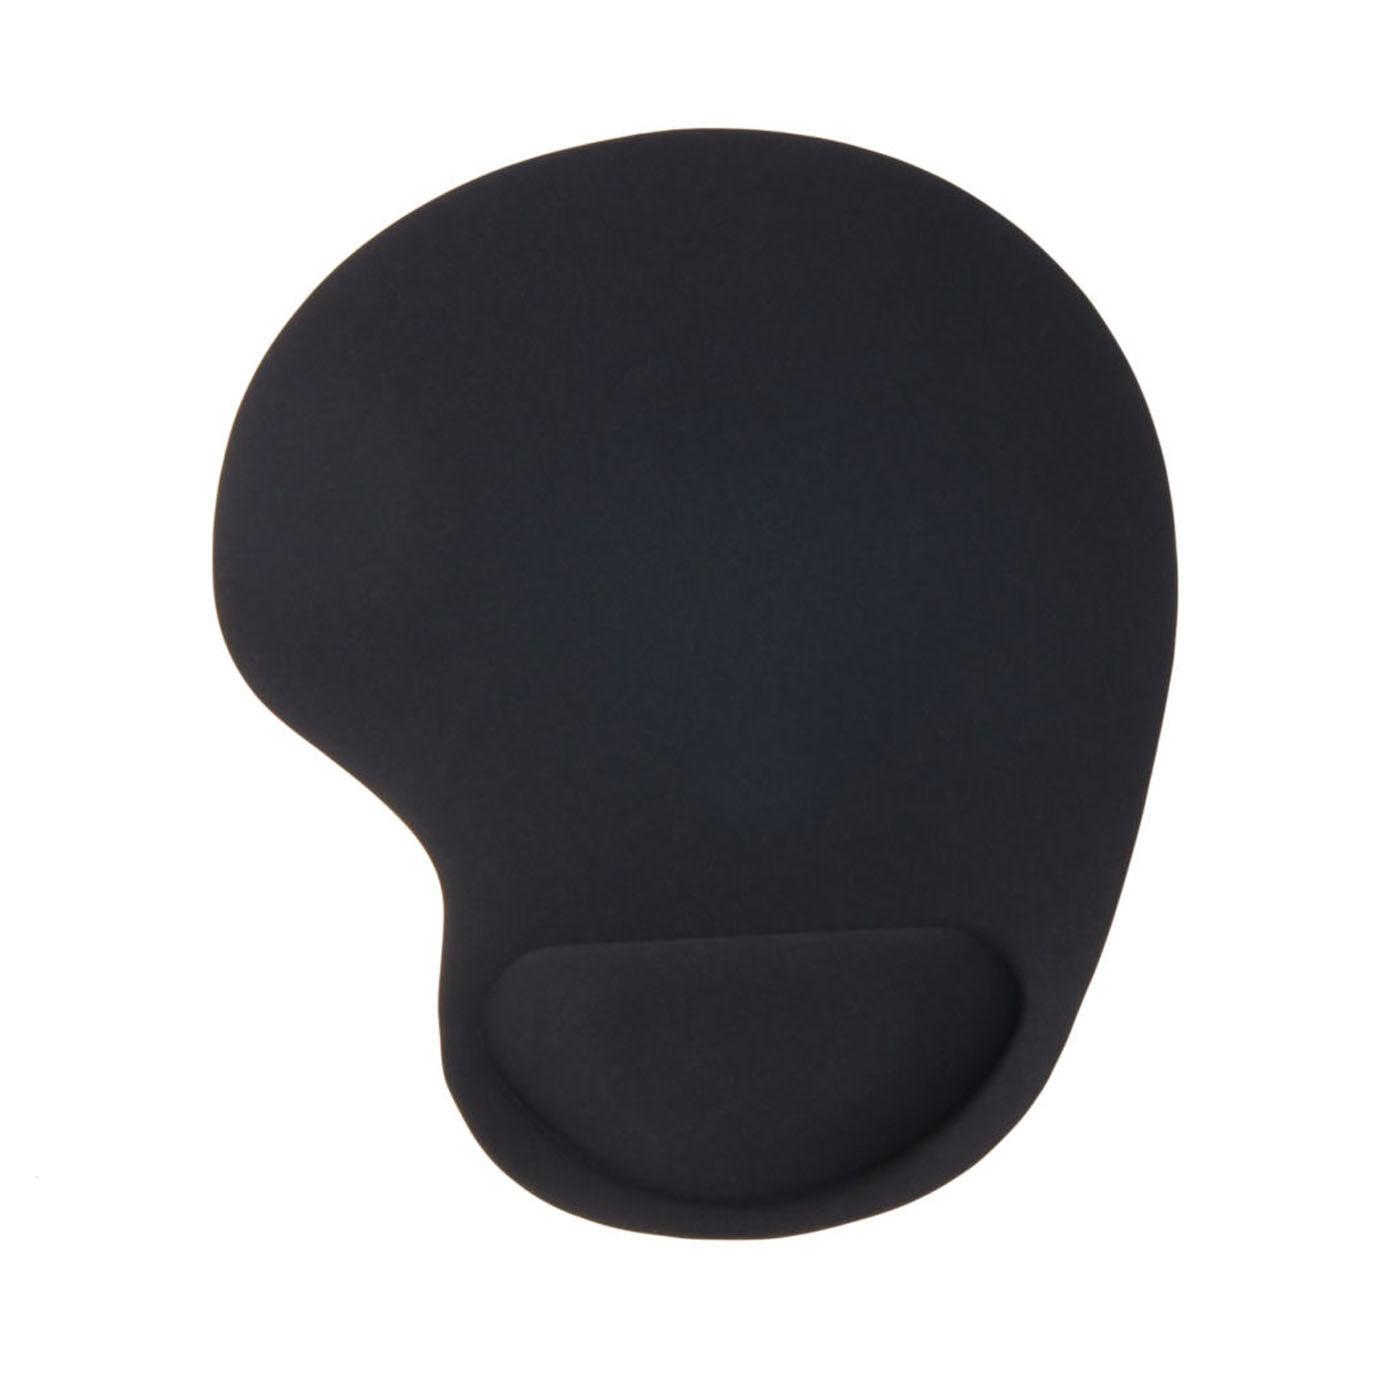 Mouse Mat Pad Comfy Computer Wrist Comfort New Black